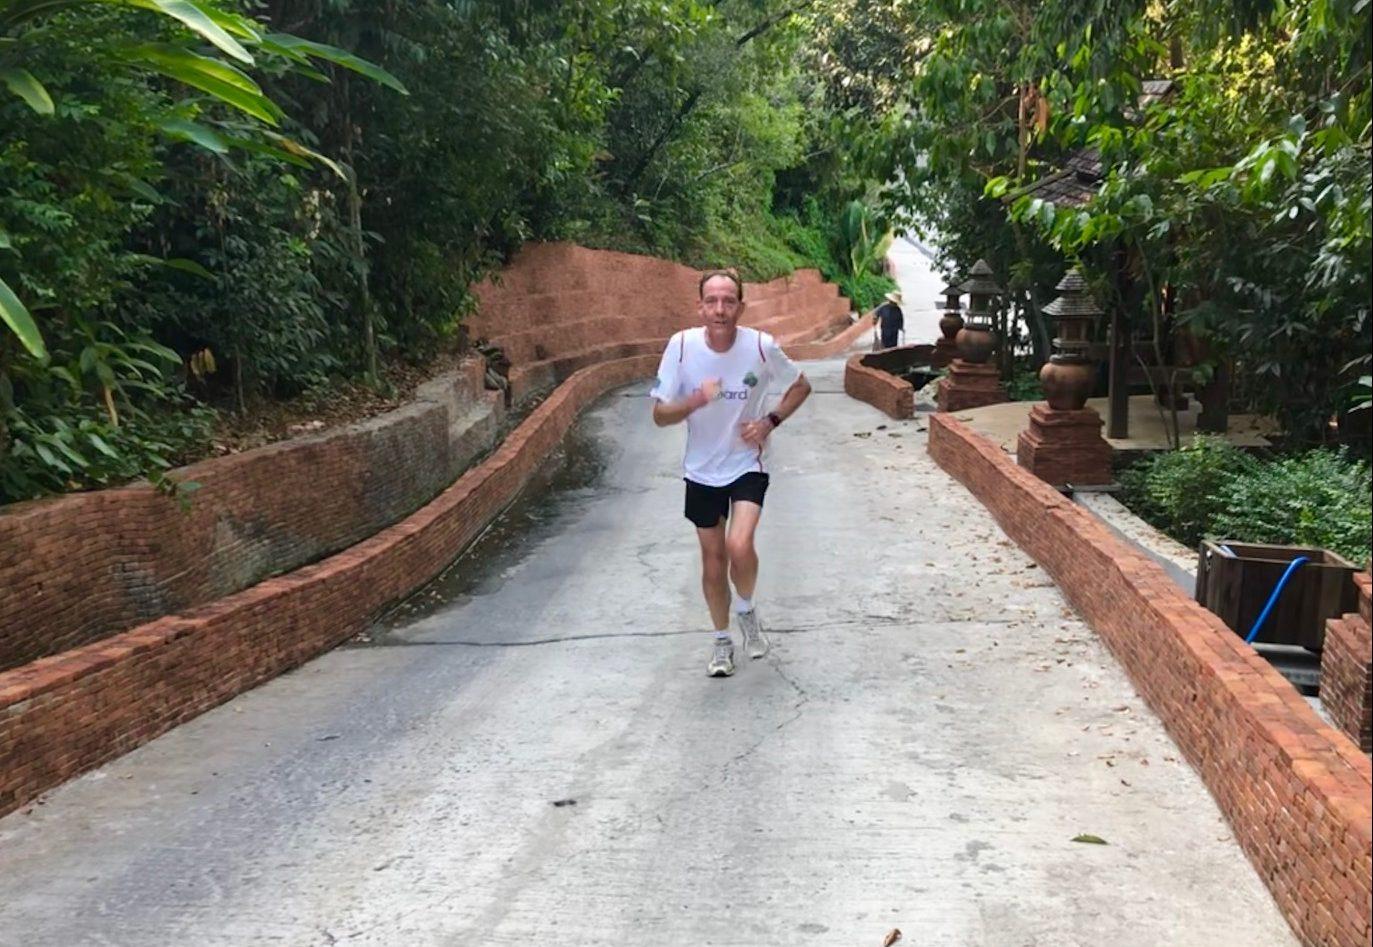 I'll never run a marathon